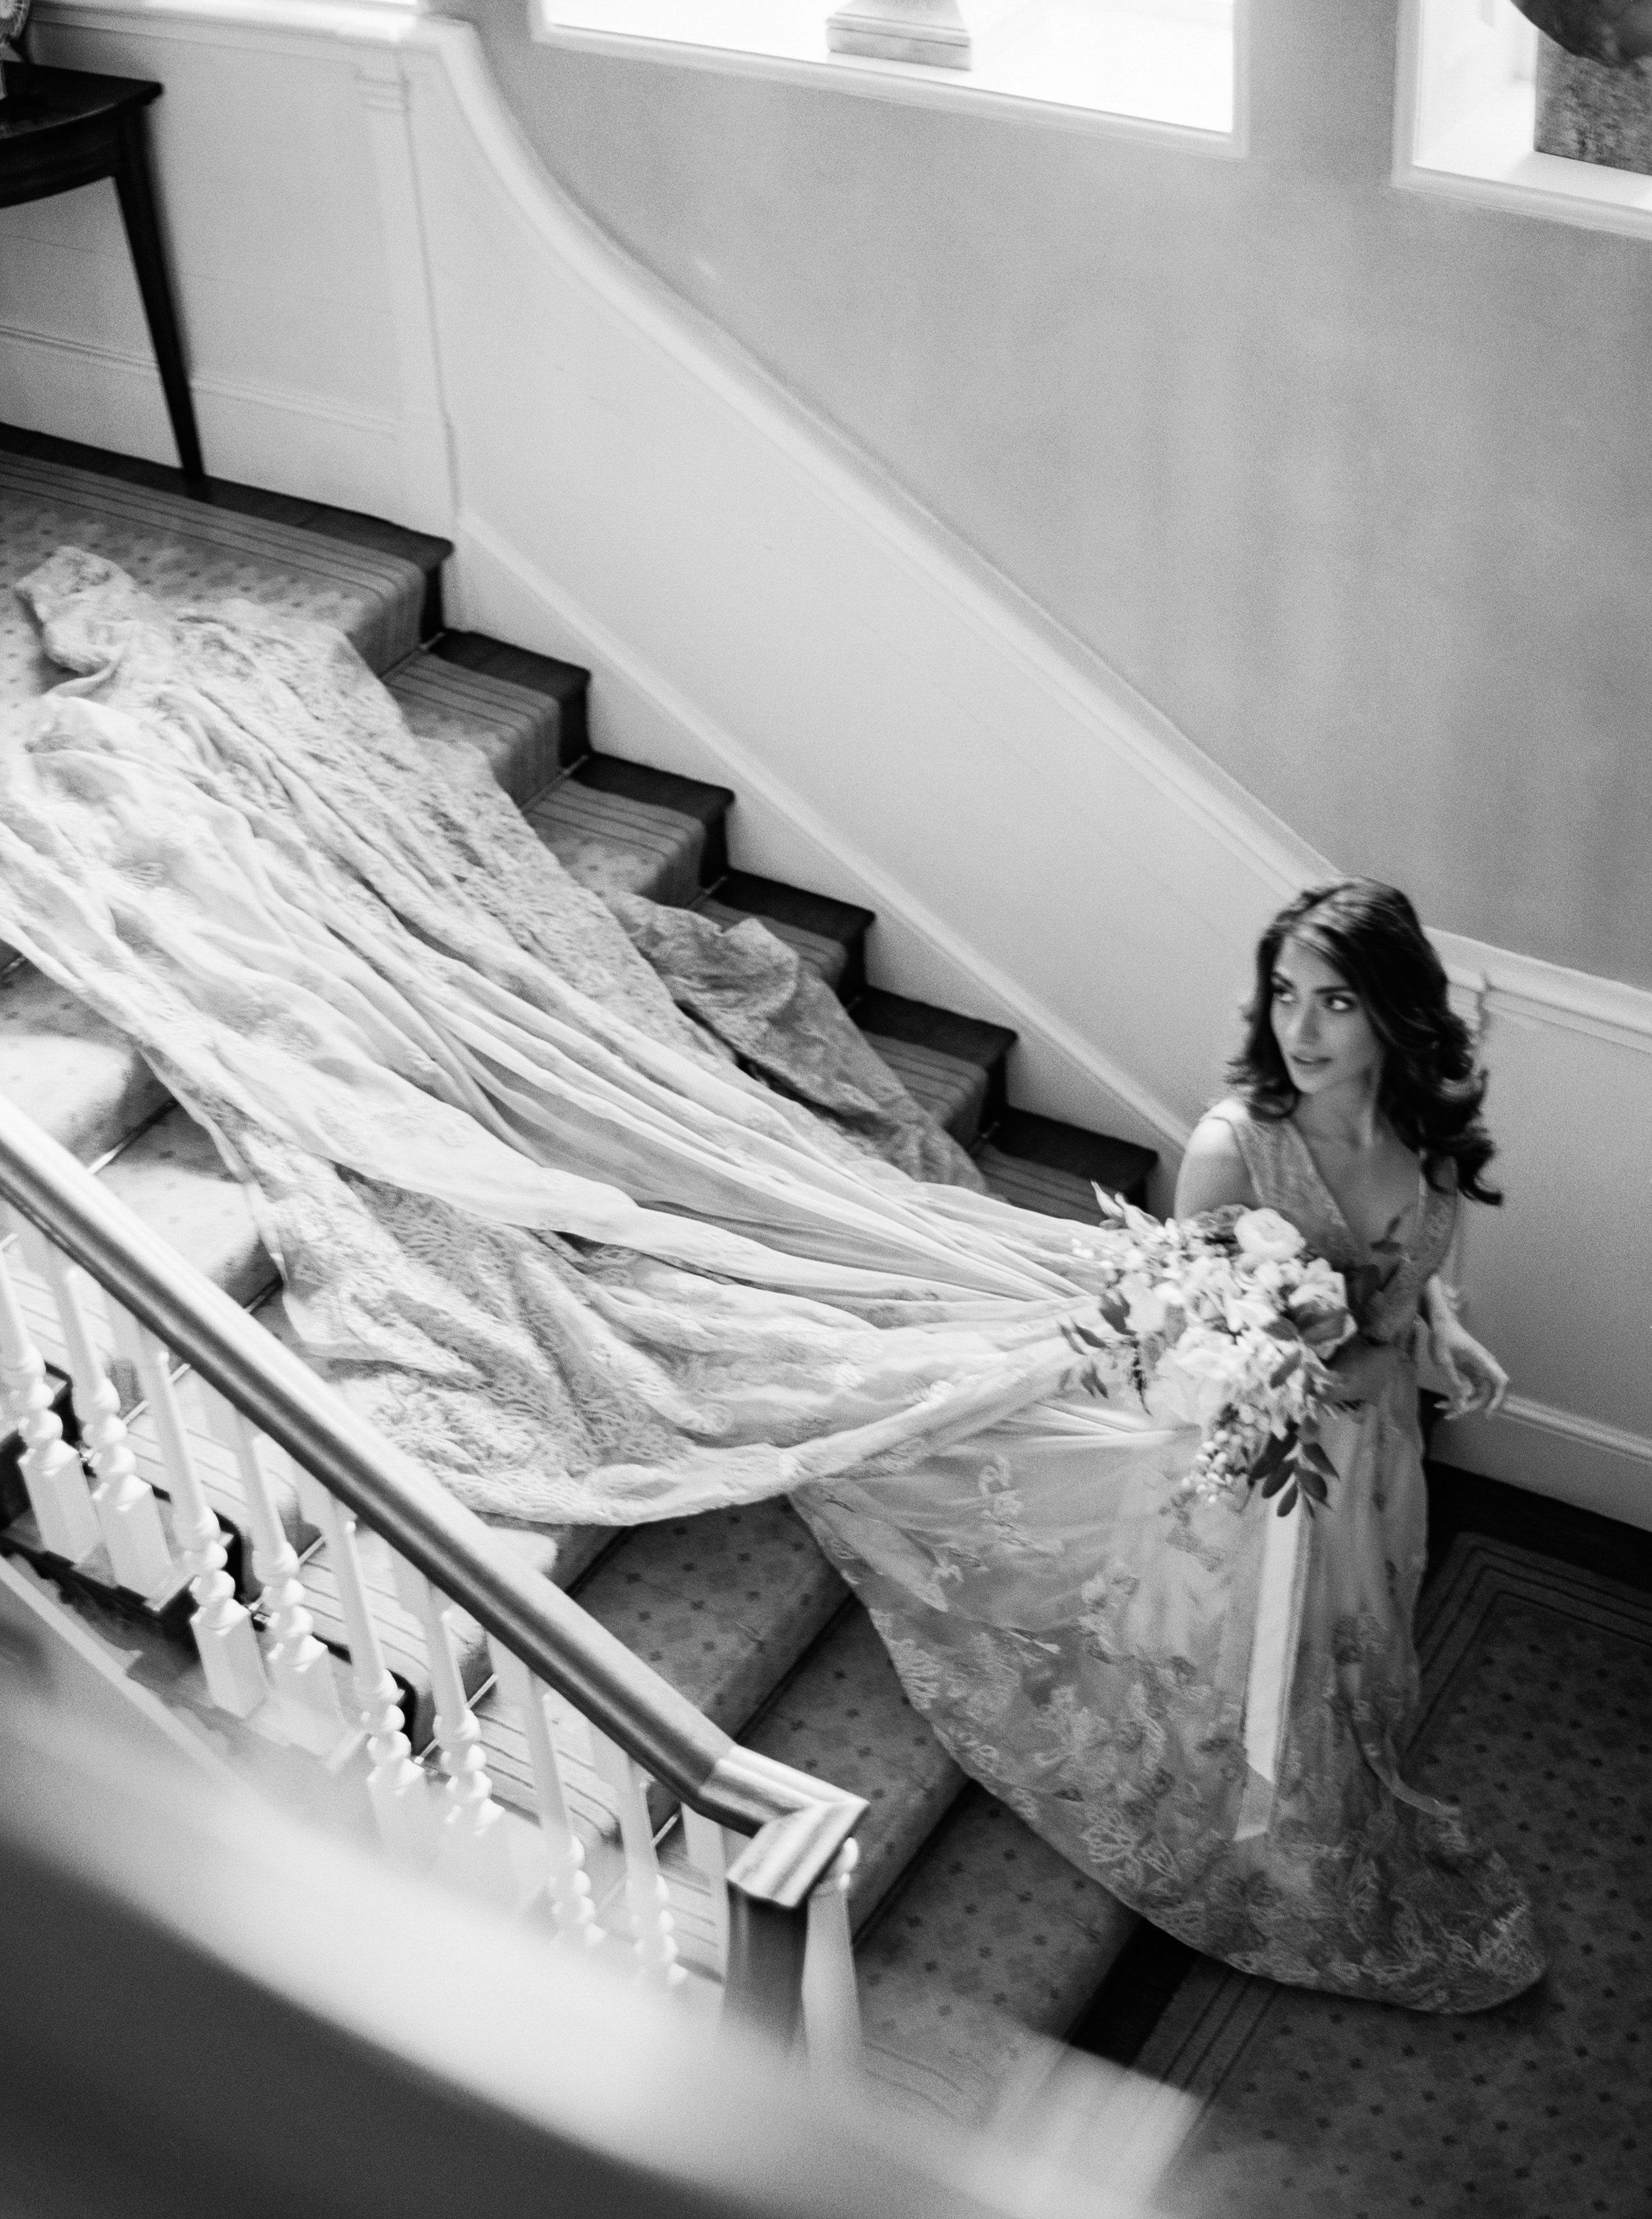 MelissaBlytheFineArtPhotography-CornwellManor_-14.jpg